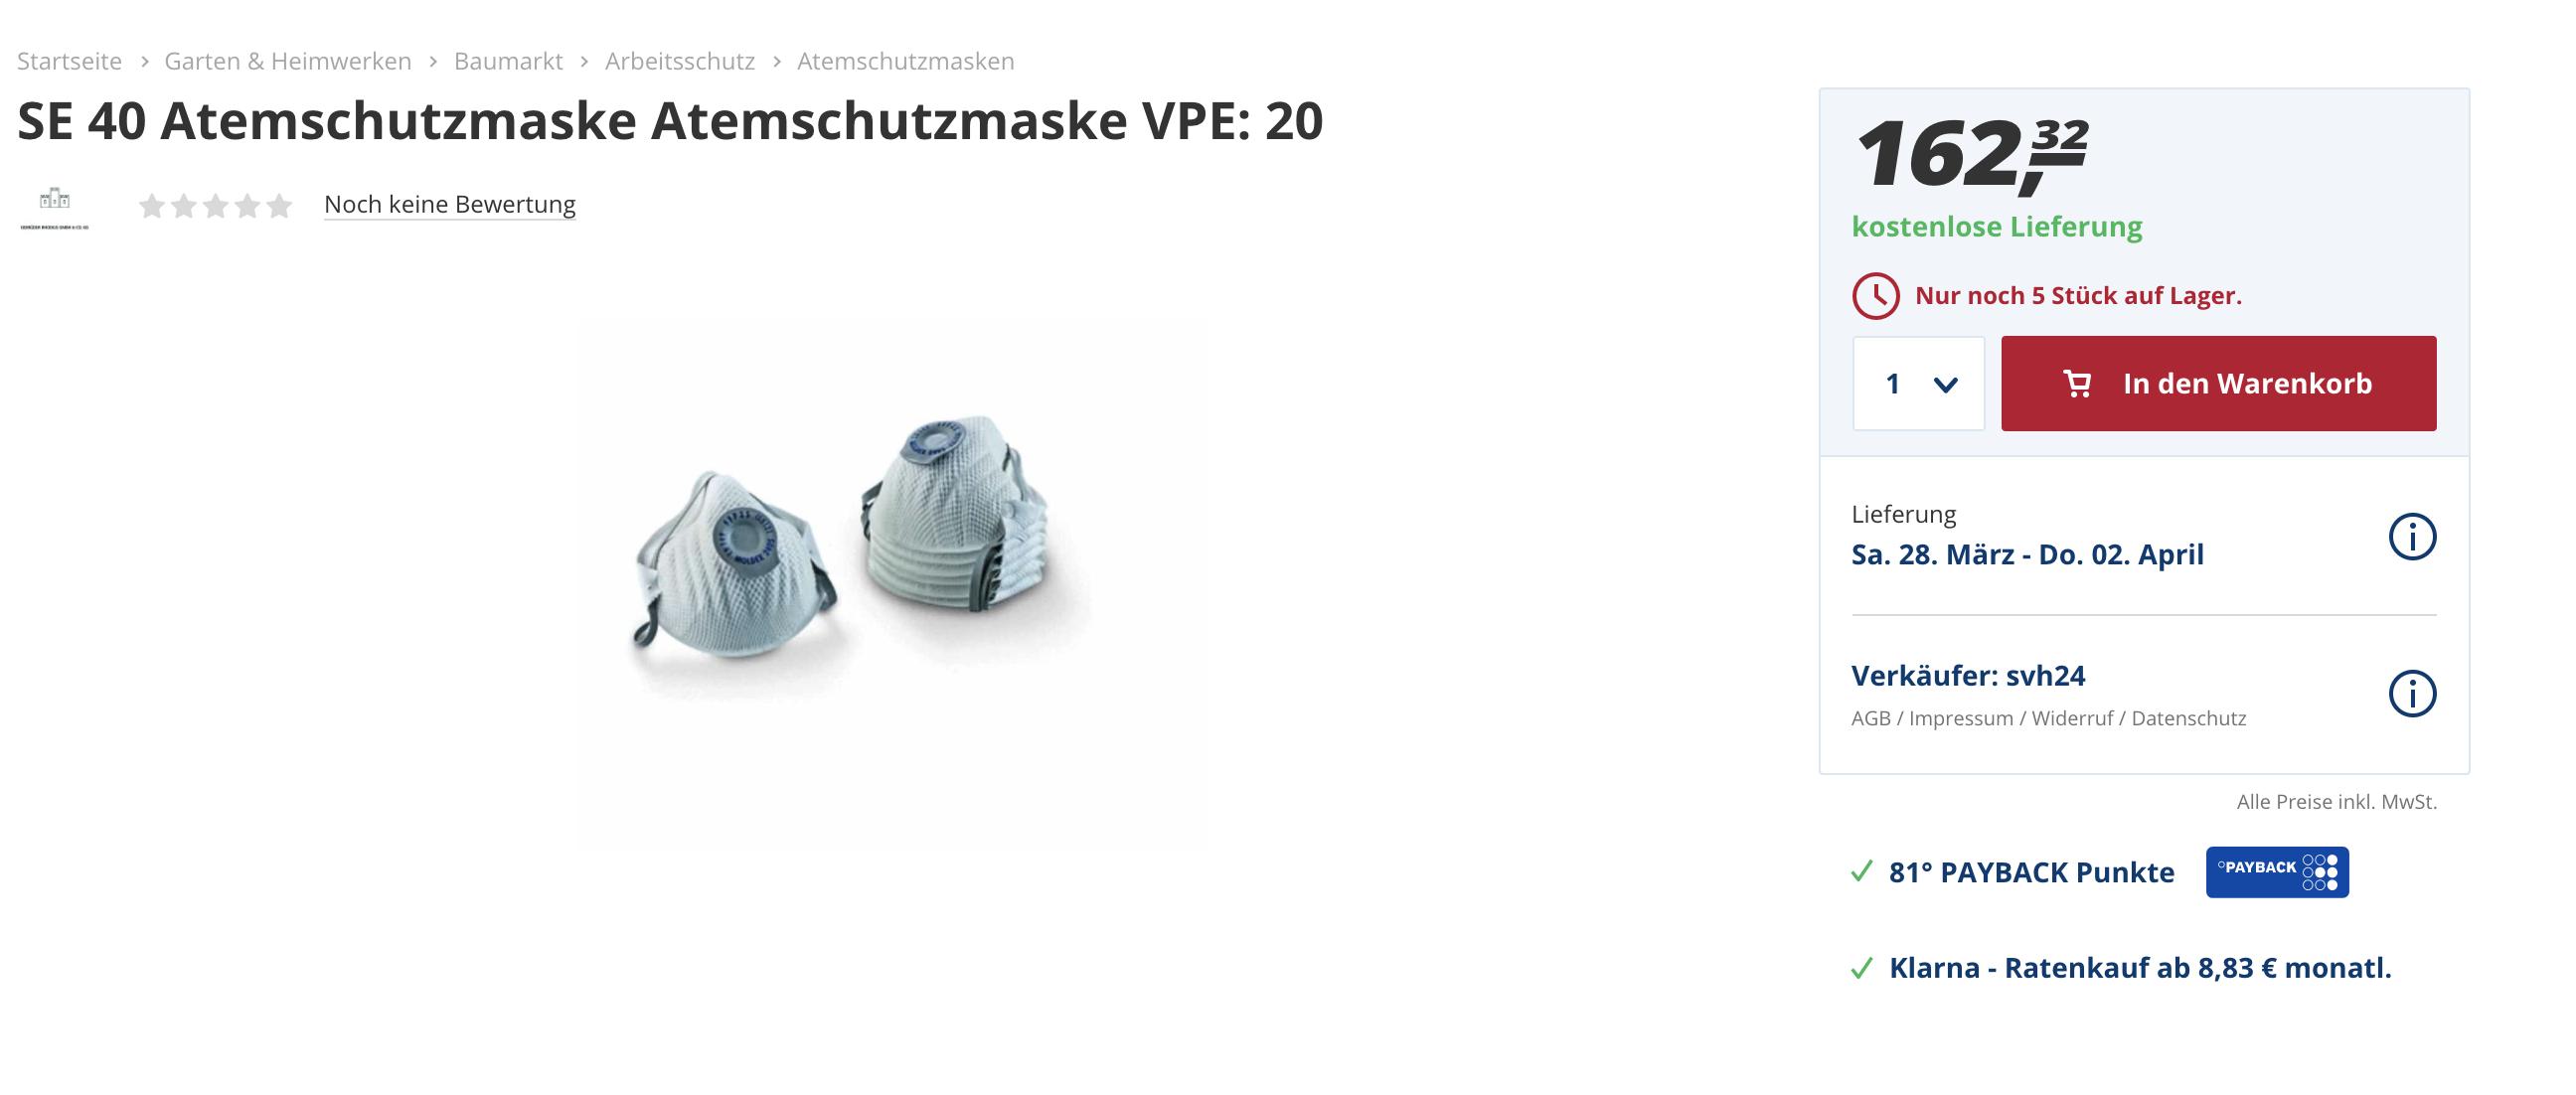 Quelle: Real.de (Screenshot / 19.03.20)